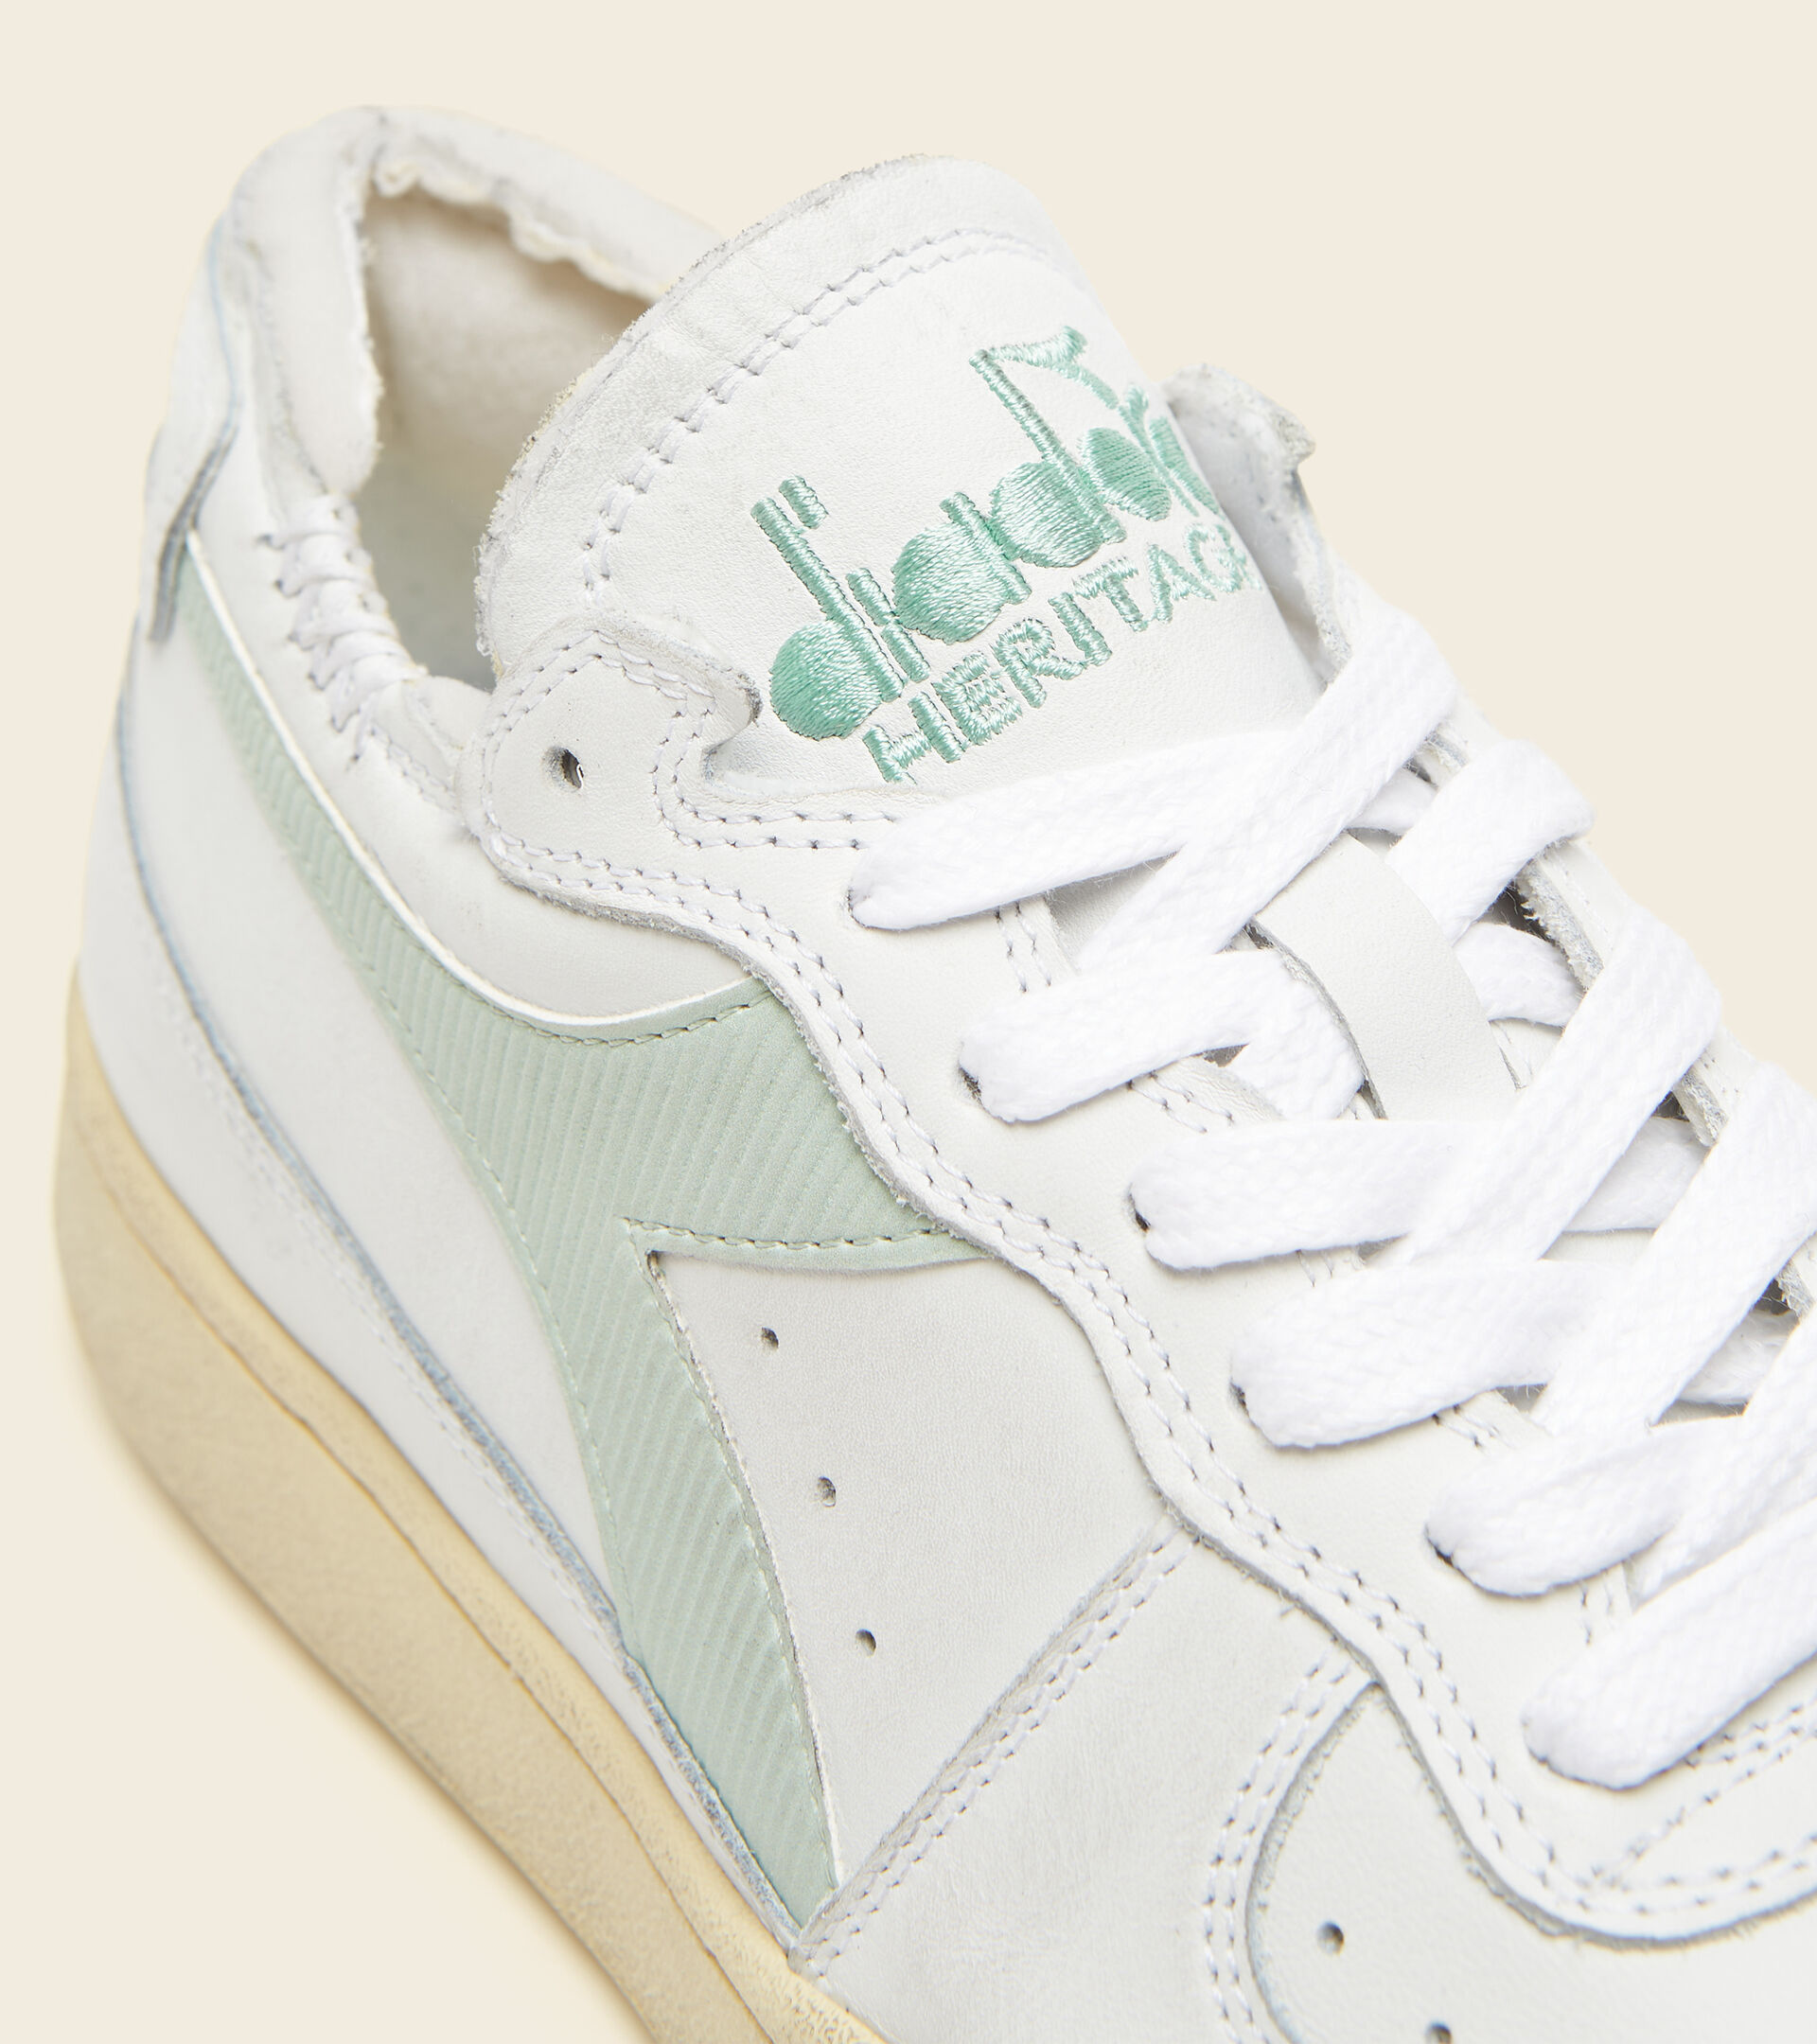 Footwear Heritage UNISEX MI BASKET ROW CUT BIANCO/VERDE FUMO Diadora